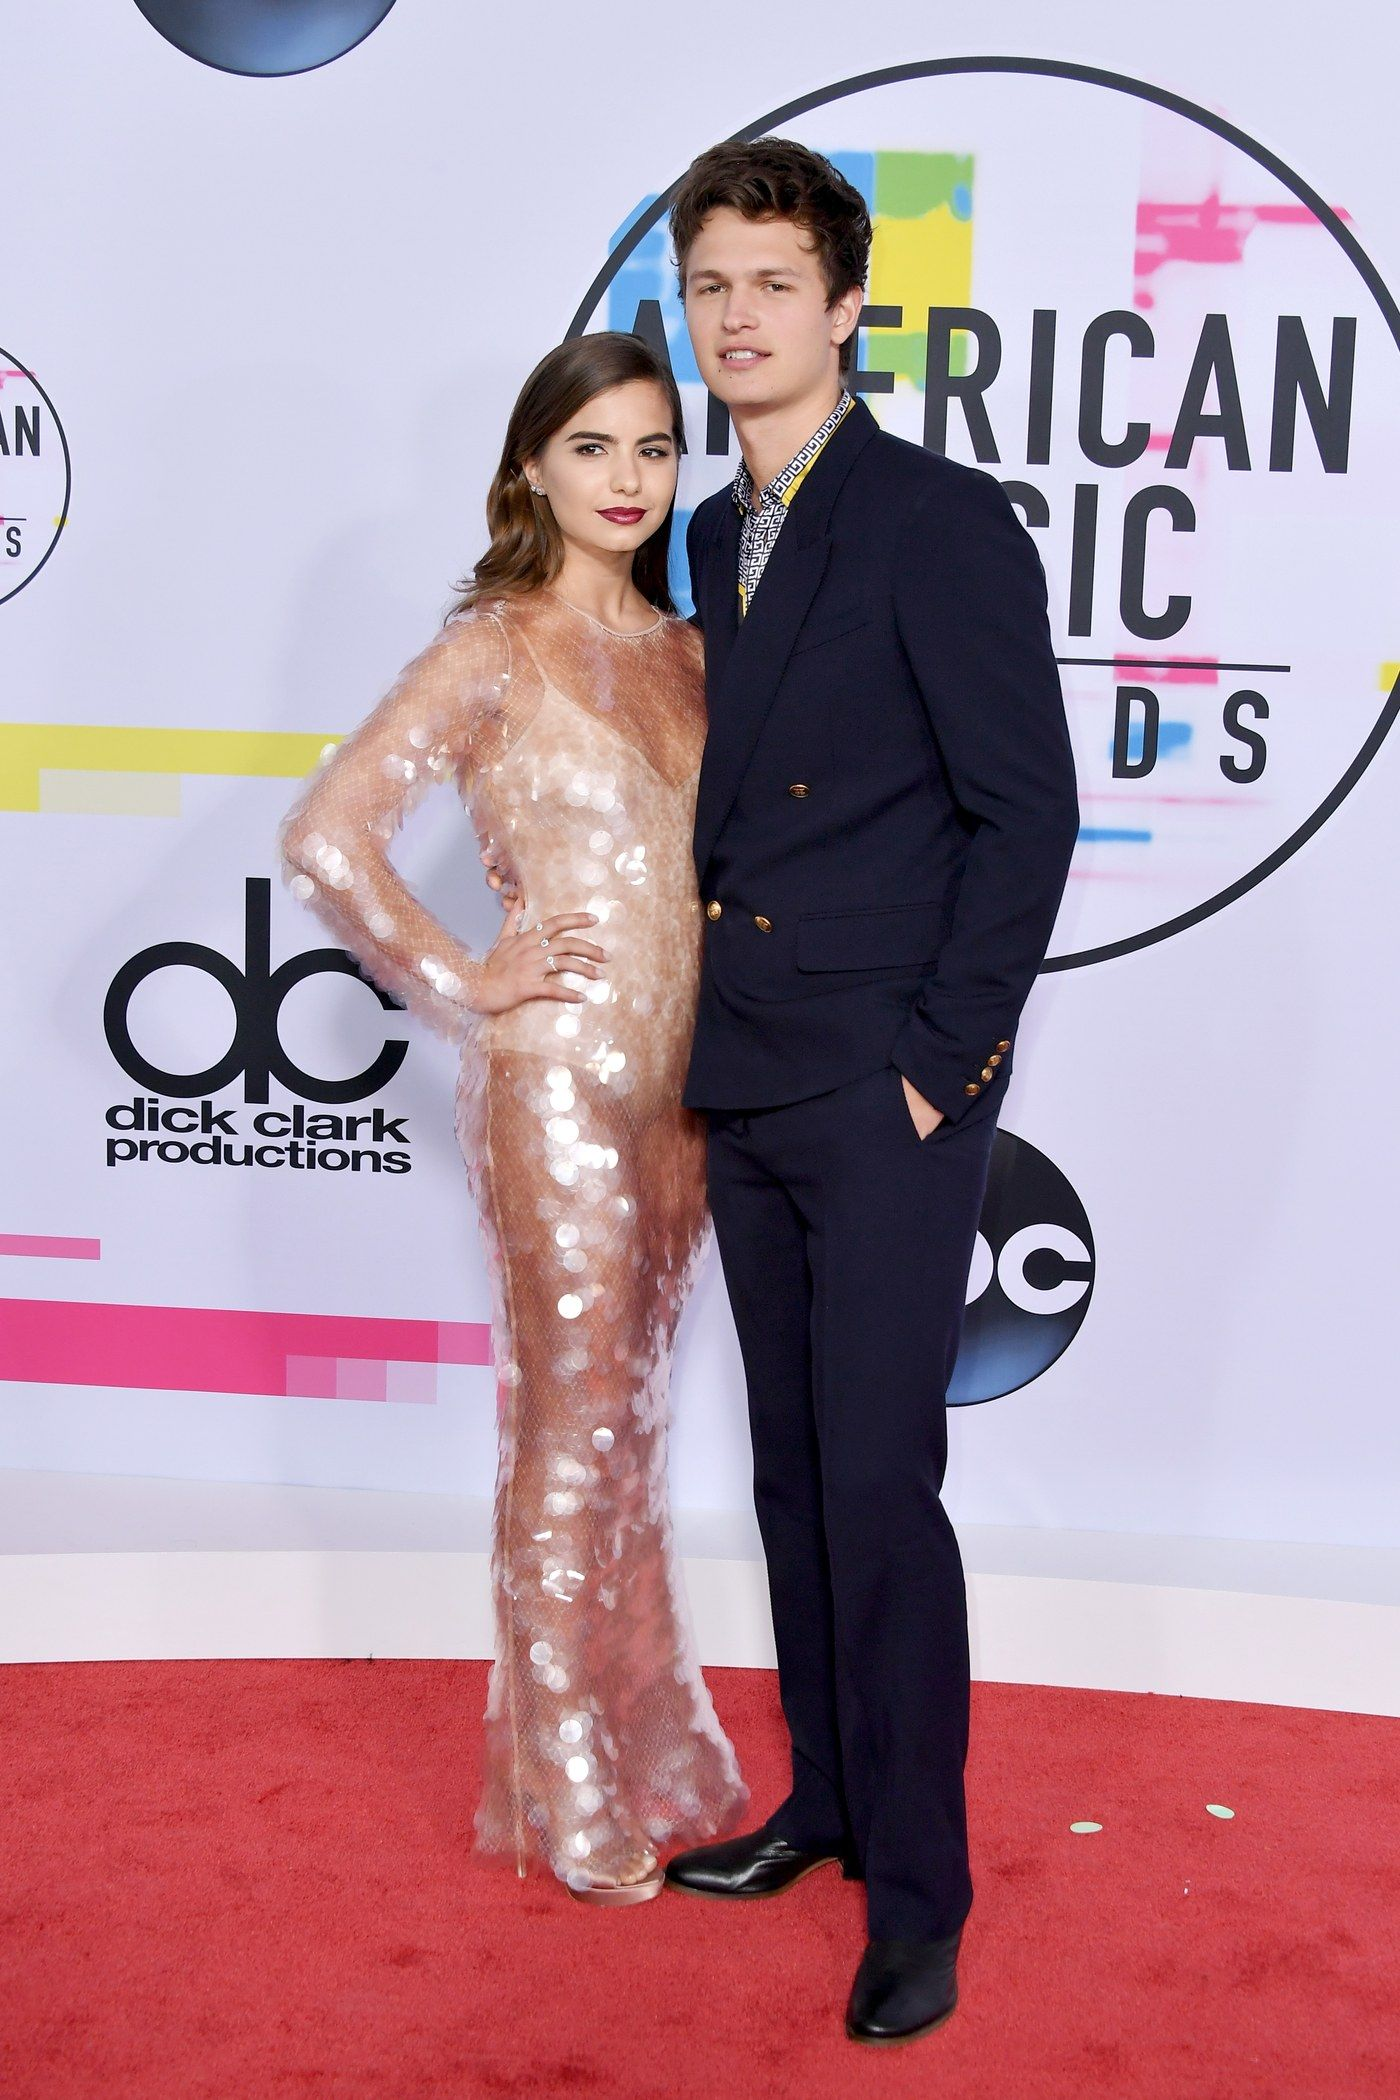 Bts Shut Down The Amas Red Carpet In Saint Laurent Red Carpet Fashion American Music Awards 2017 American Music Awards